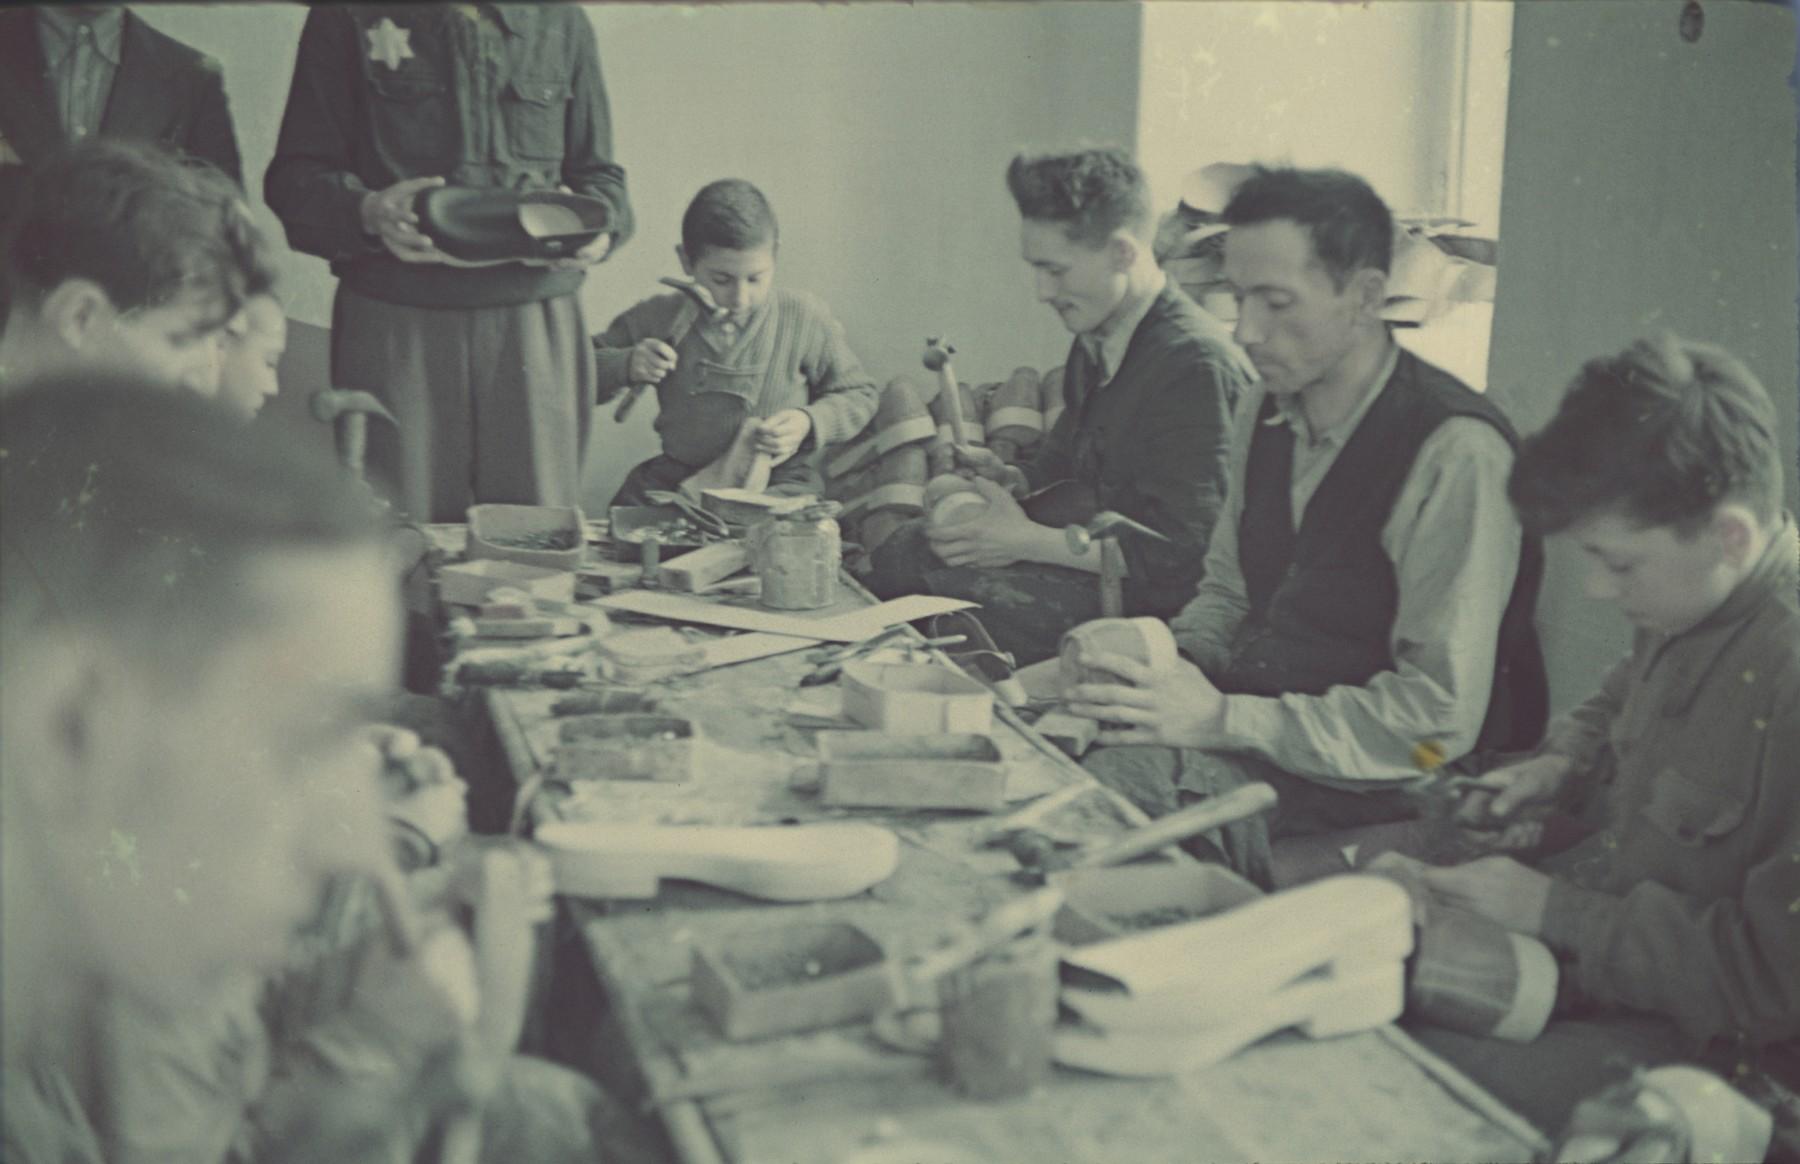 "Workers manufacture wooden shoes in the Lodz ghetto.  Original German caption: ""Litzmannstadt-Geto, Holtzschufabrik"" (wooden shoe factory), #19."